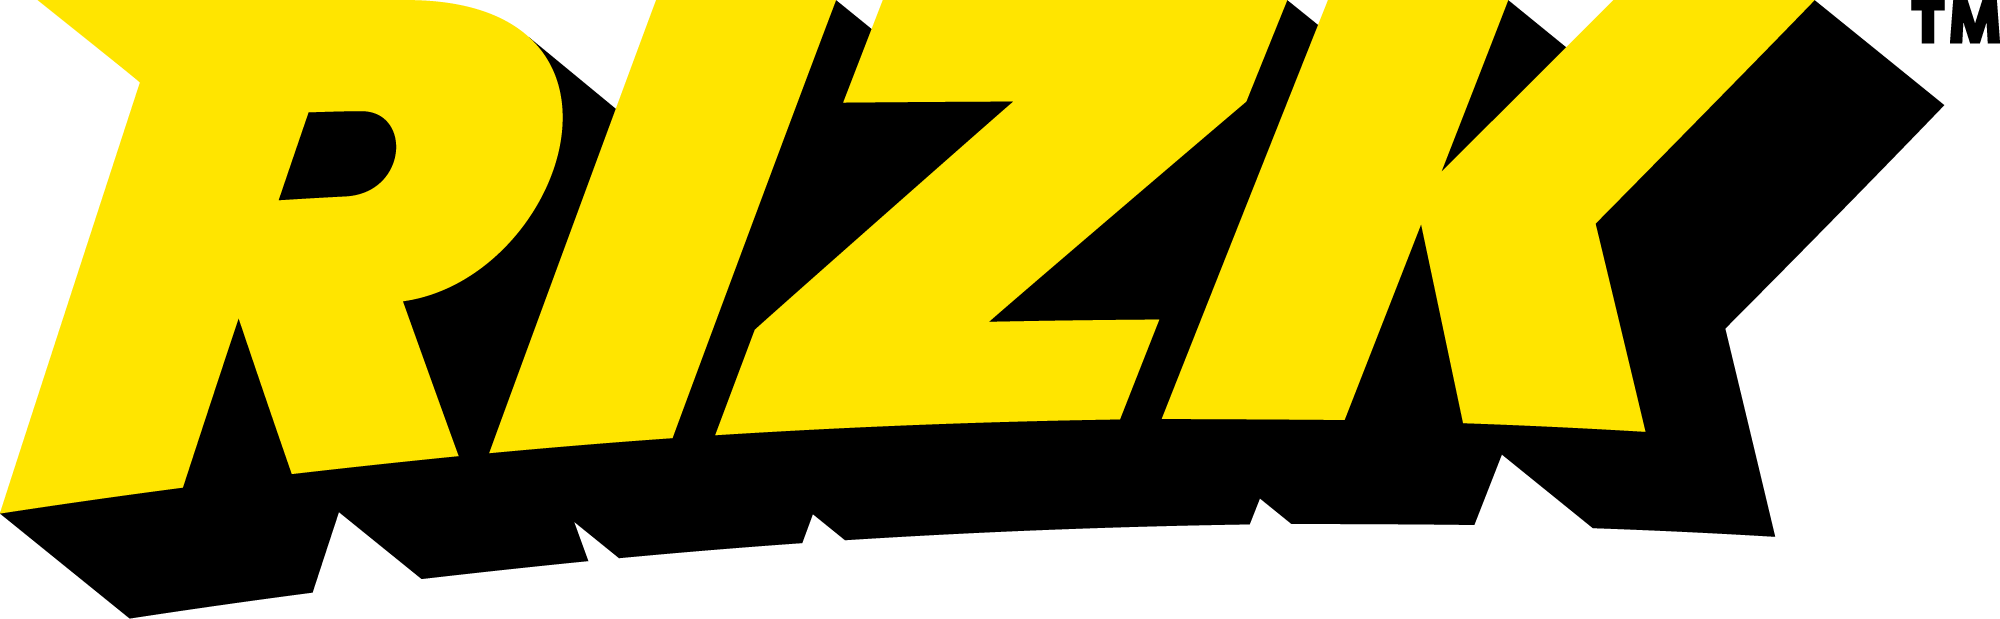 rizk-kasino-logo